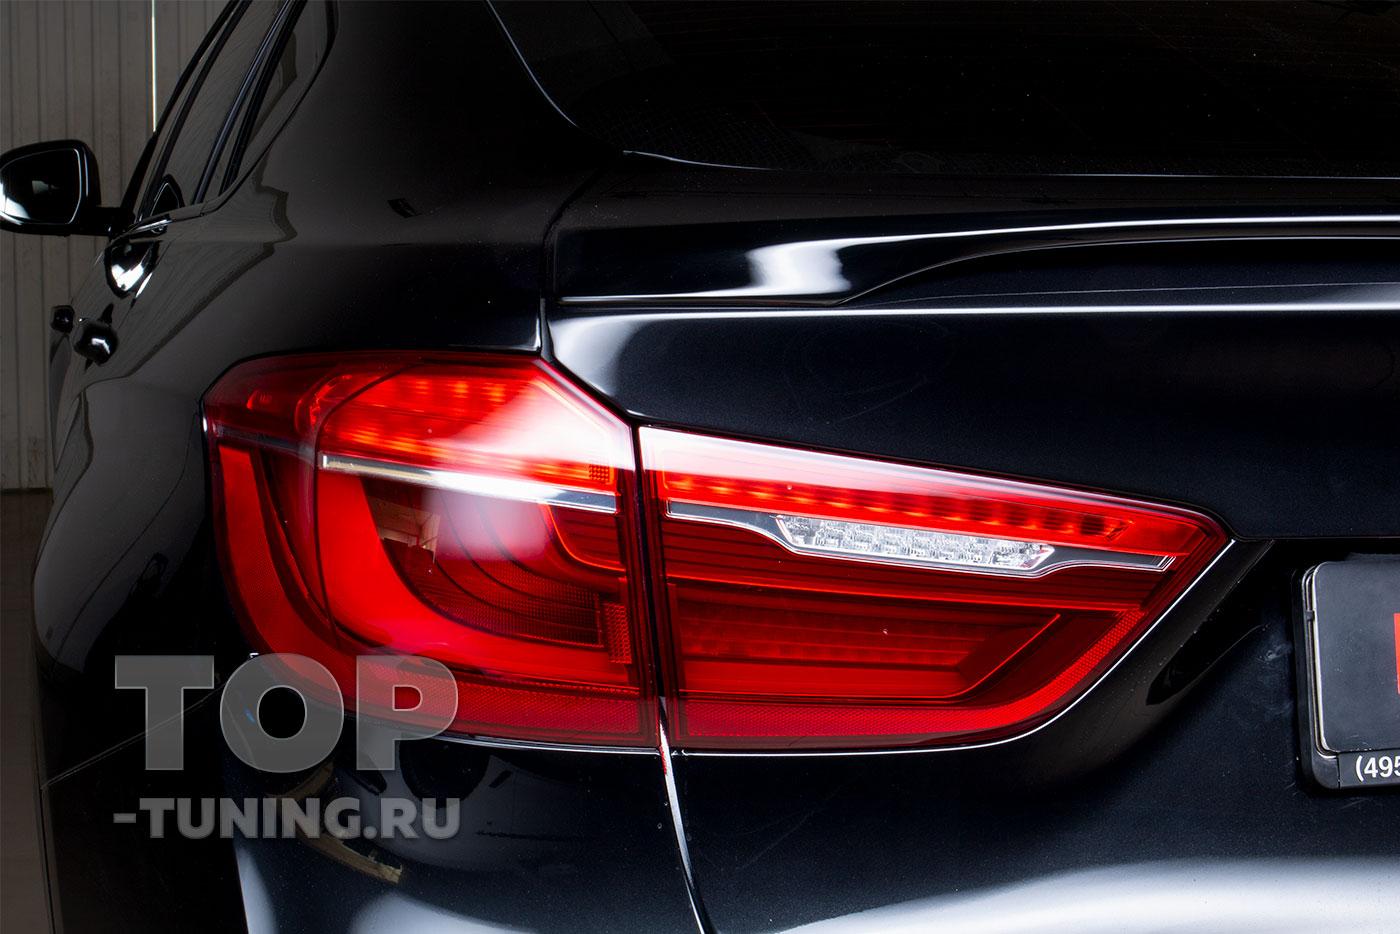 103281 Установка спойлера Performance на BMW X6 F16